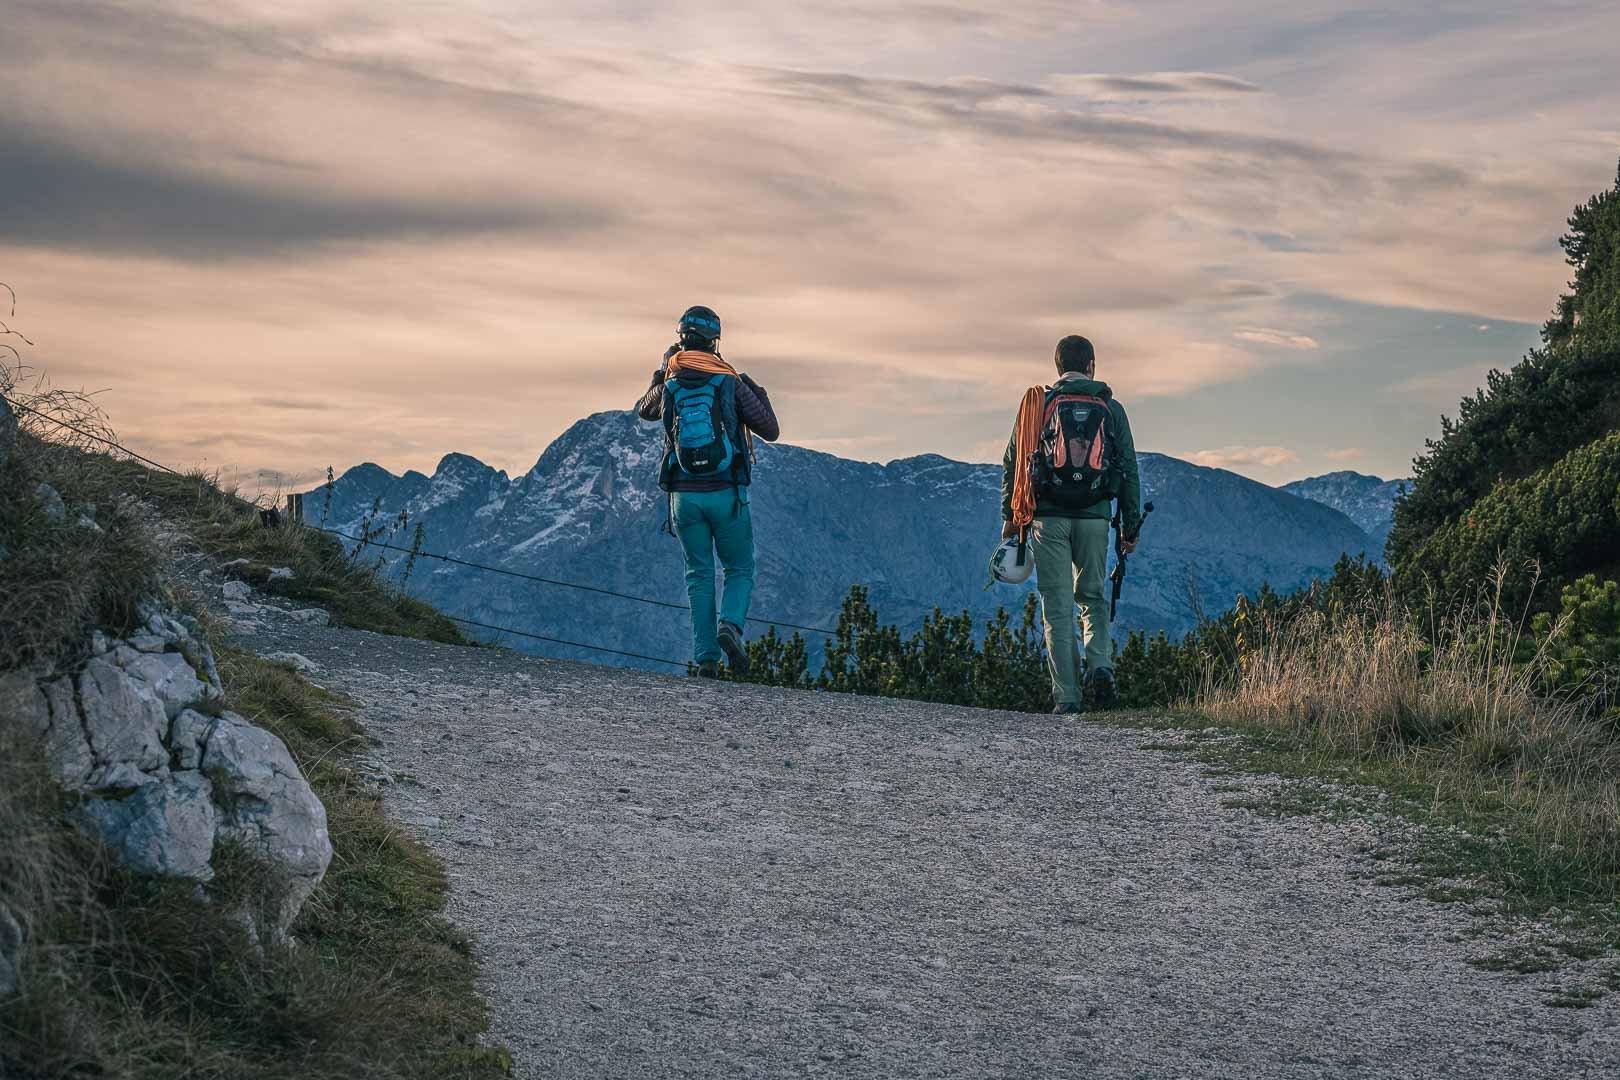 Climbers on Untersberg mountain